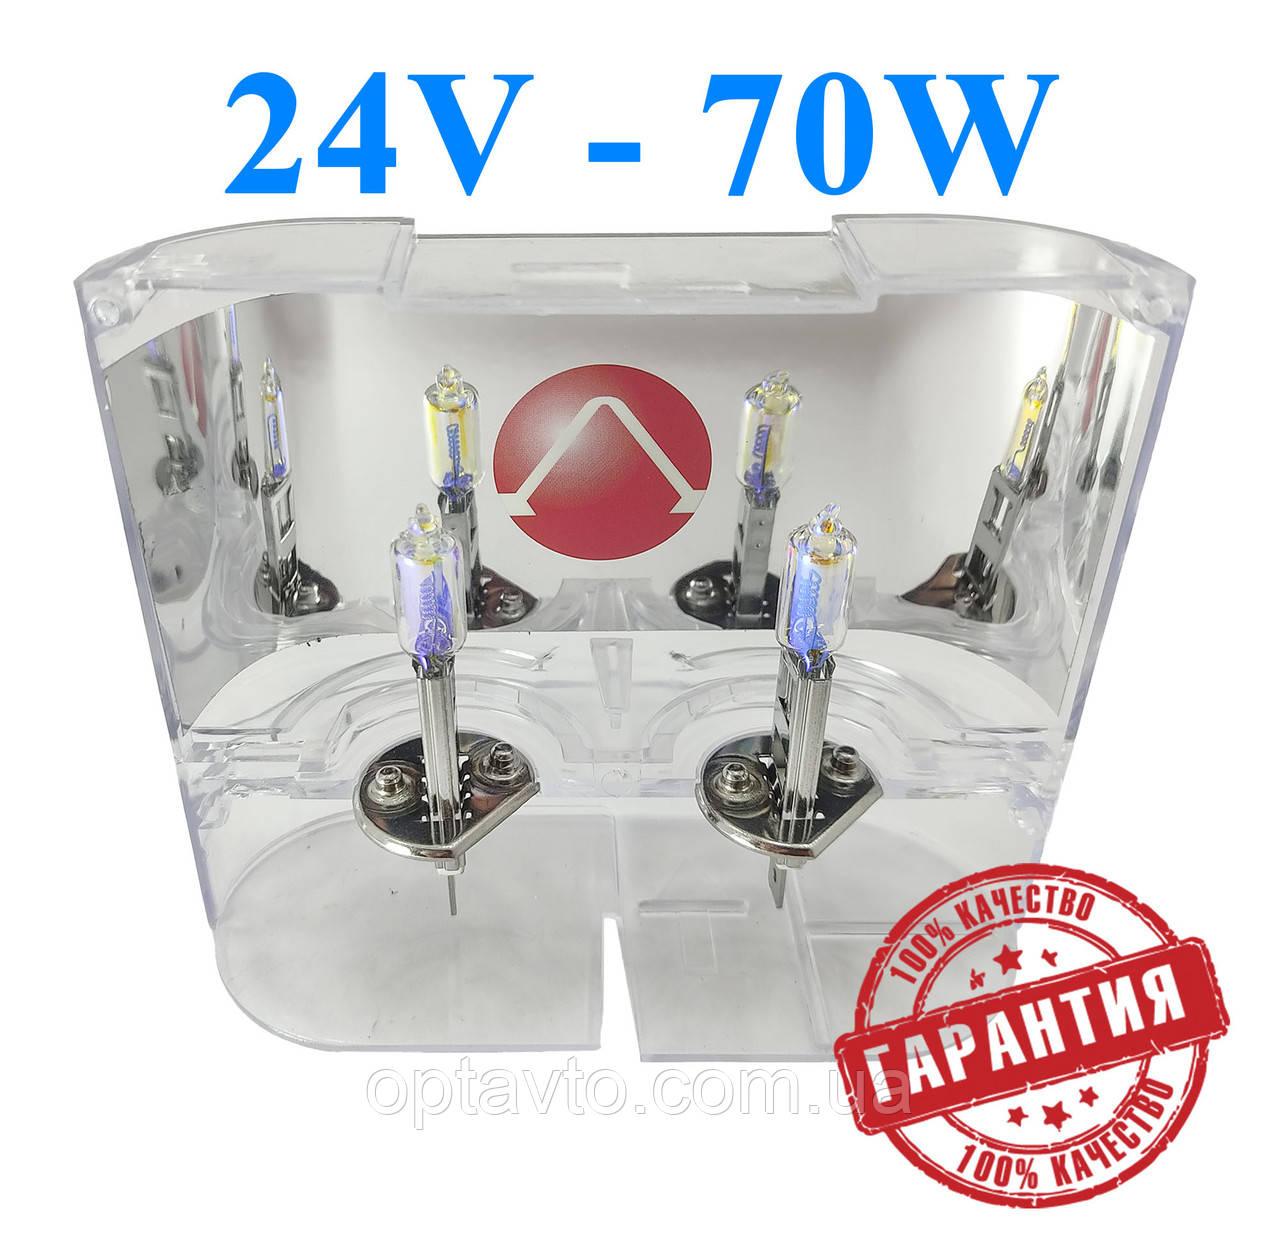 Xenon Vision Лампы H-1 24V 70W P14,5S NLFS Лампы с эффектом ксенона Cool Blue Intense + 30%